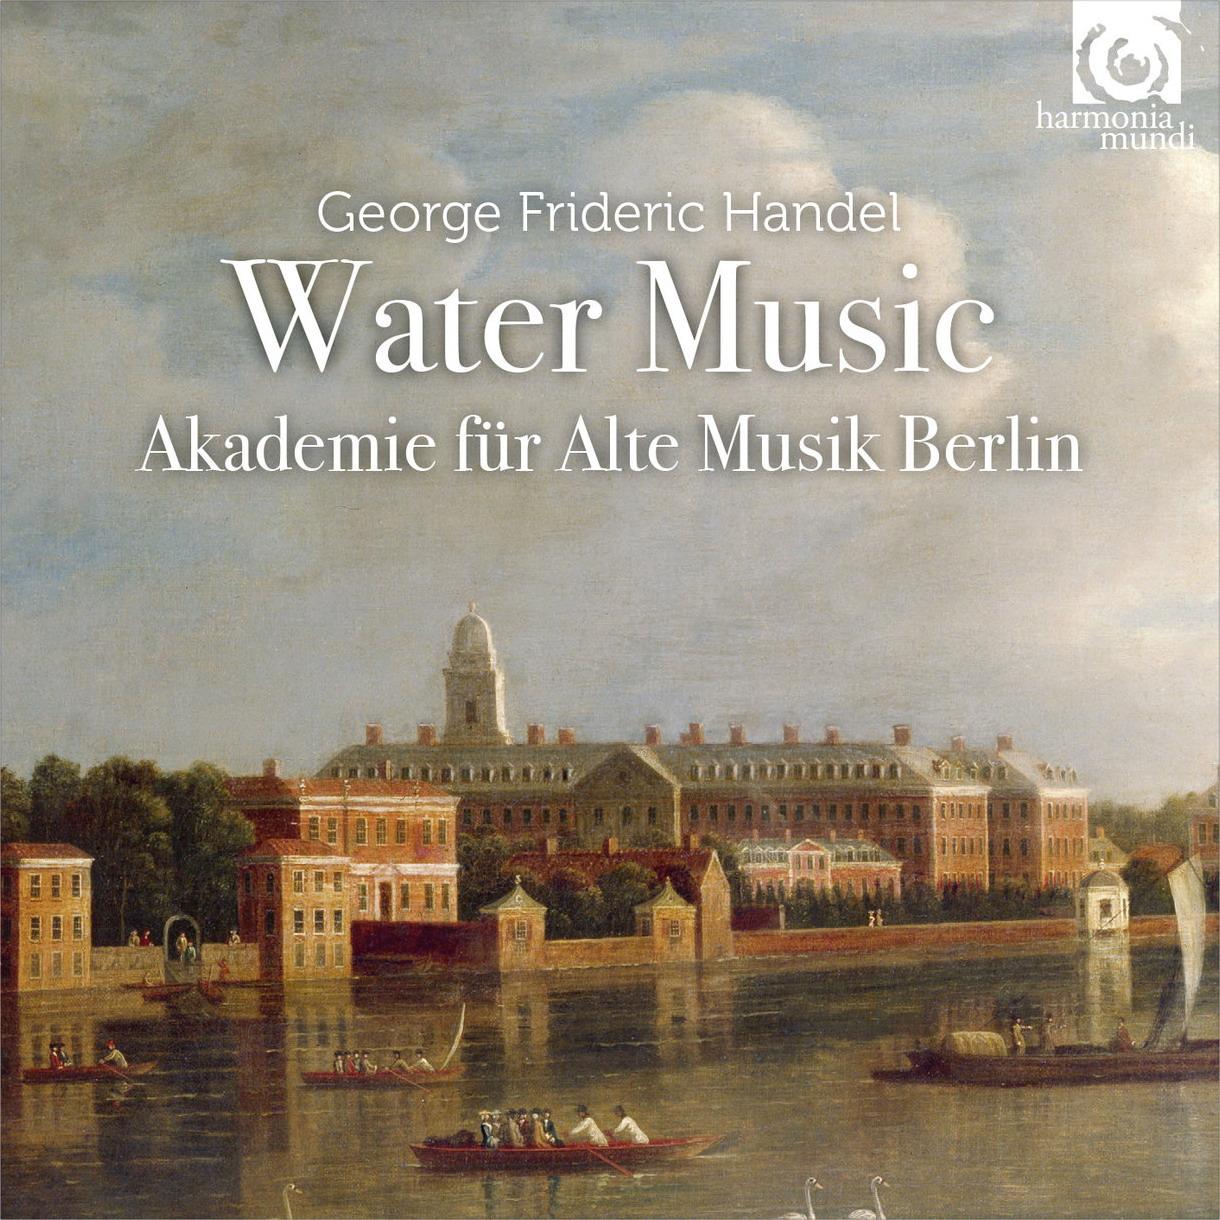 Music is the key: Akademie für Alte Musik Berlin GEORGE FRIDERIC ...